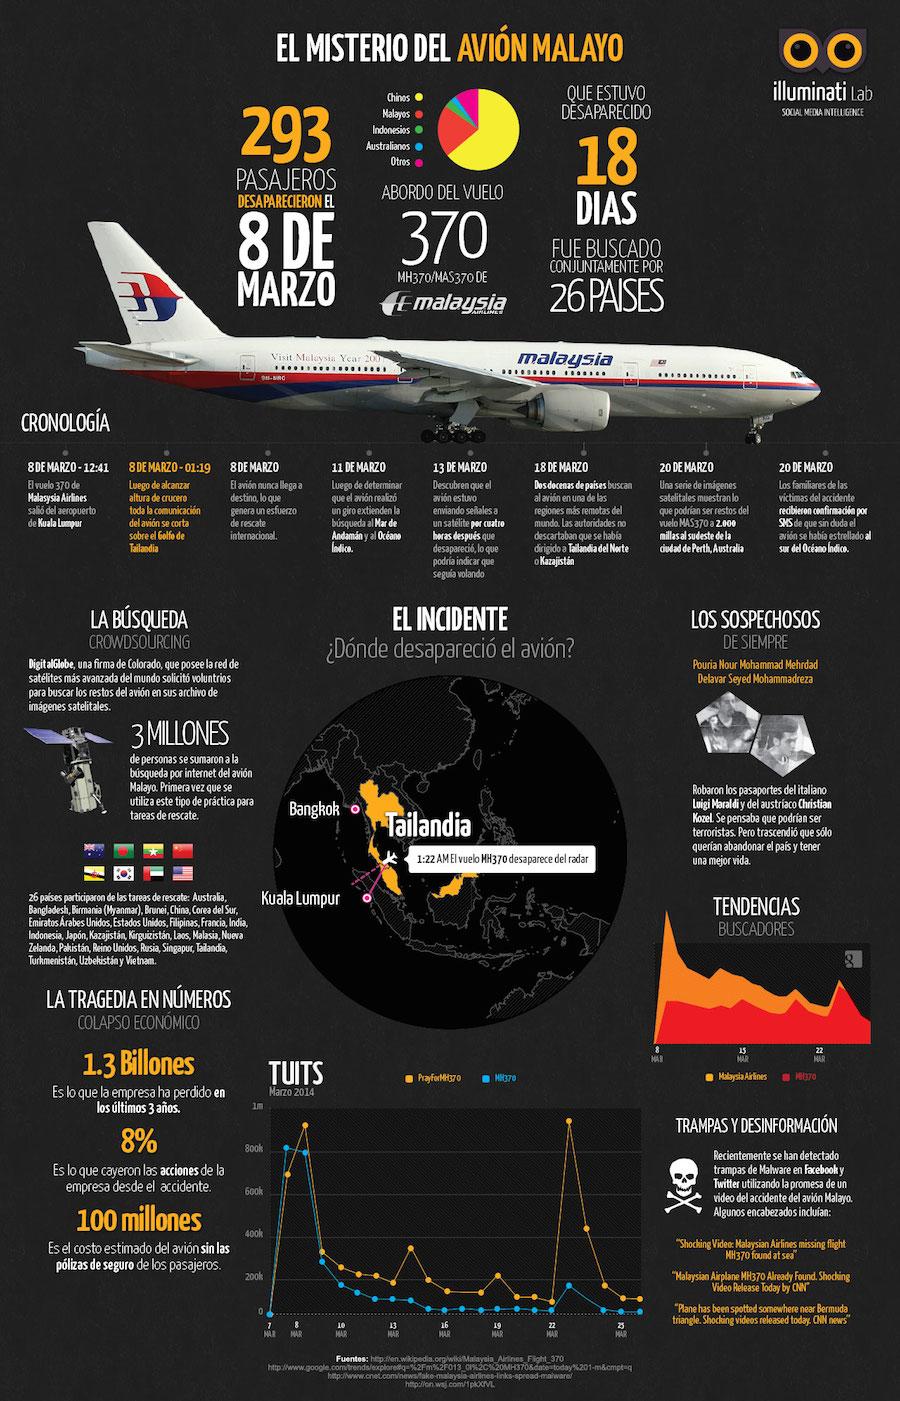 Infografia-avion-malayo